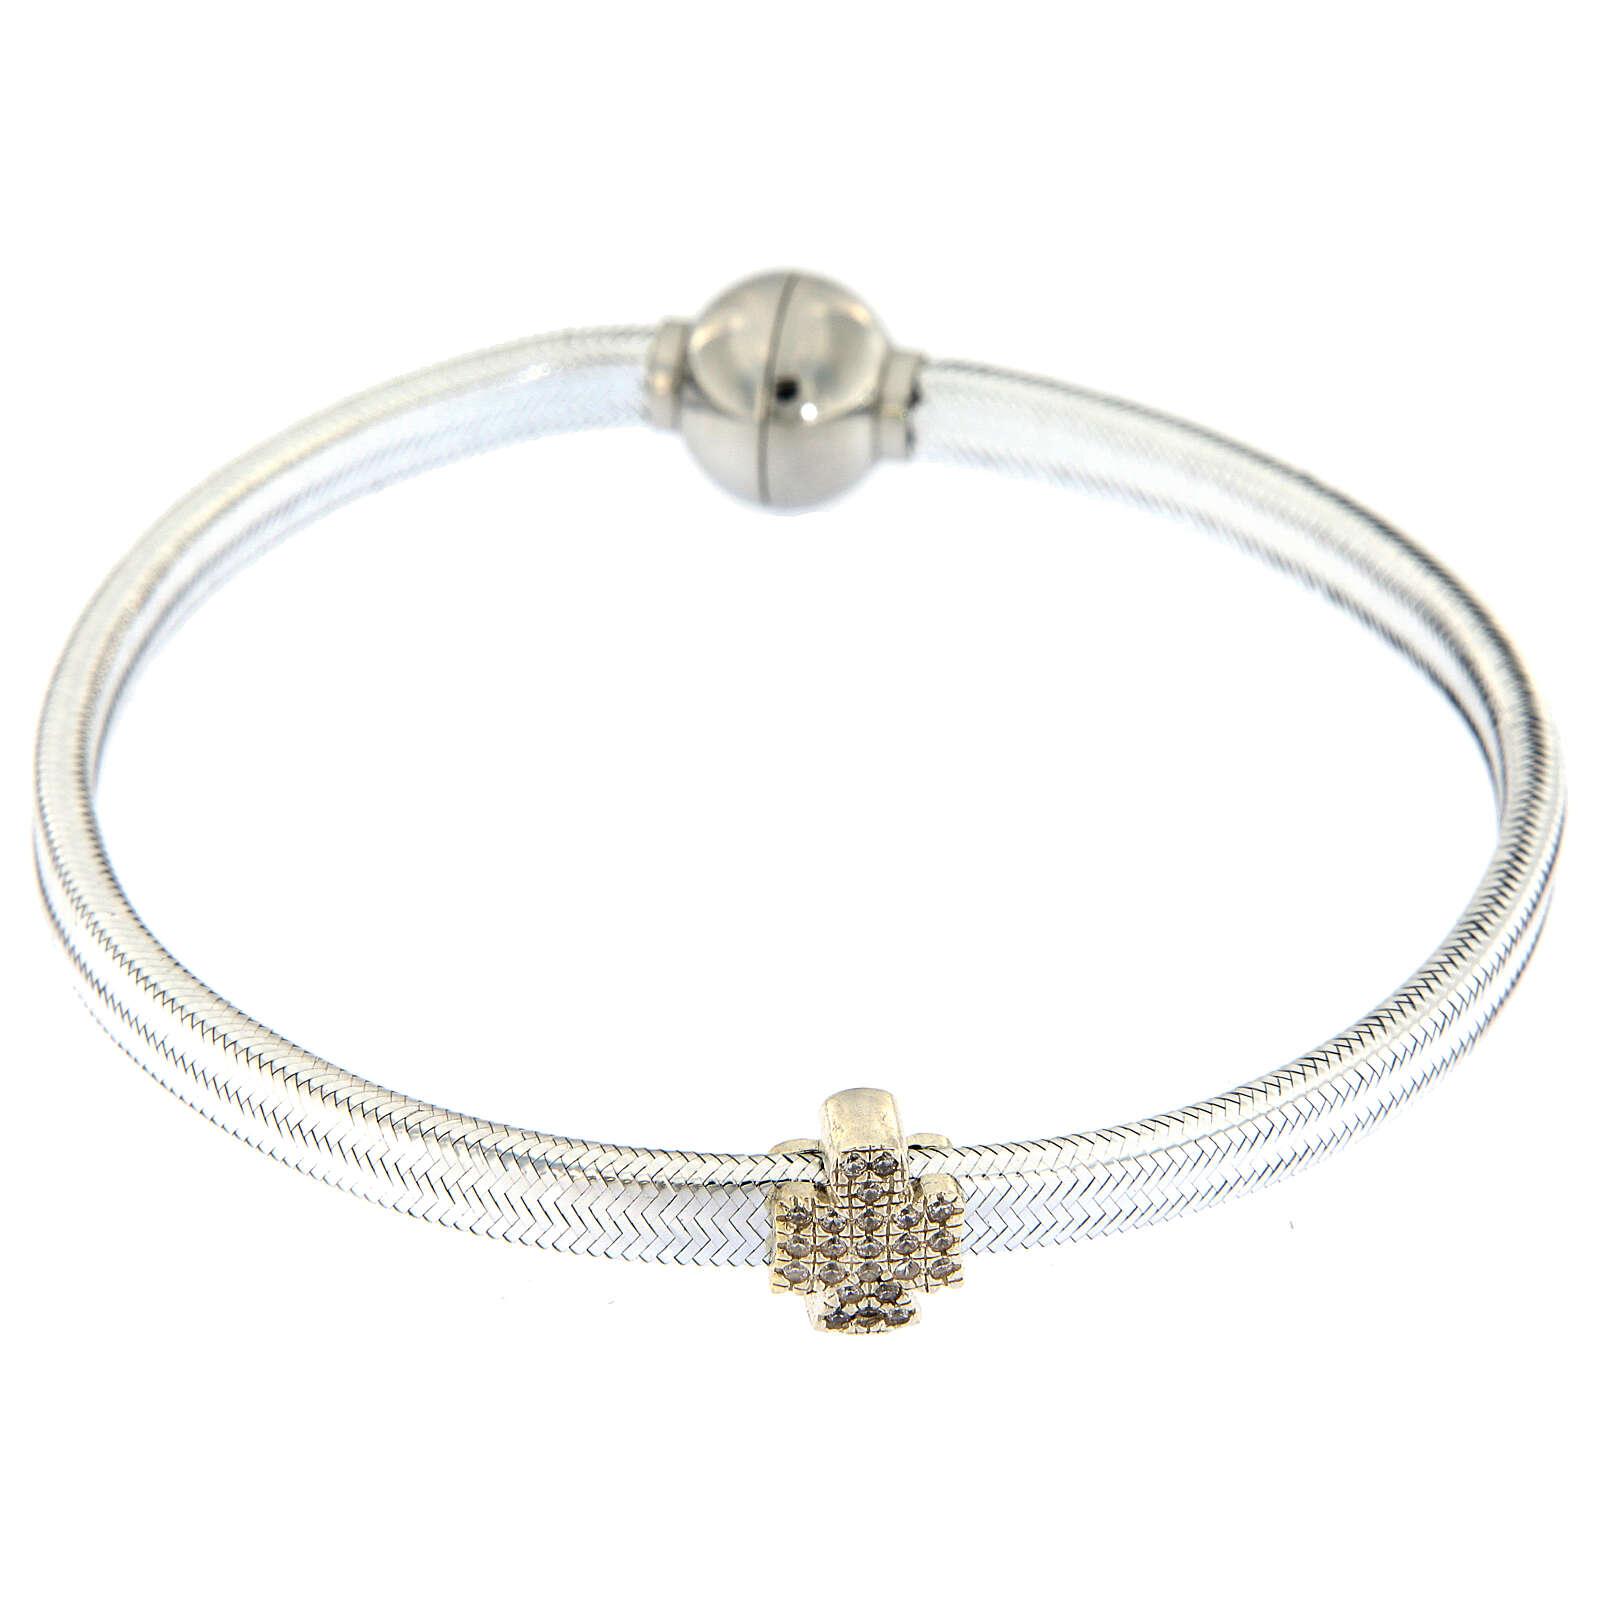 Bracciale AMEN angelo lurex argento 925 chiusura magnetica 4